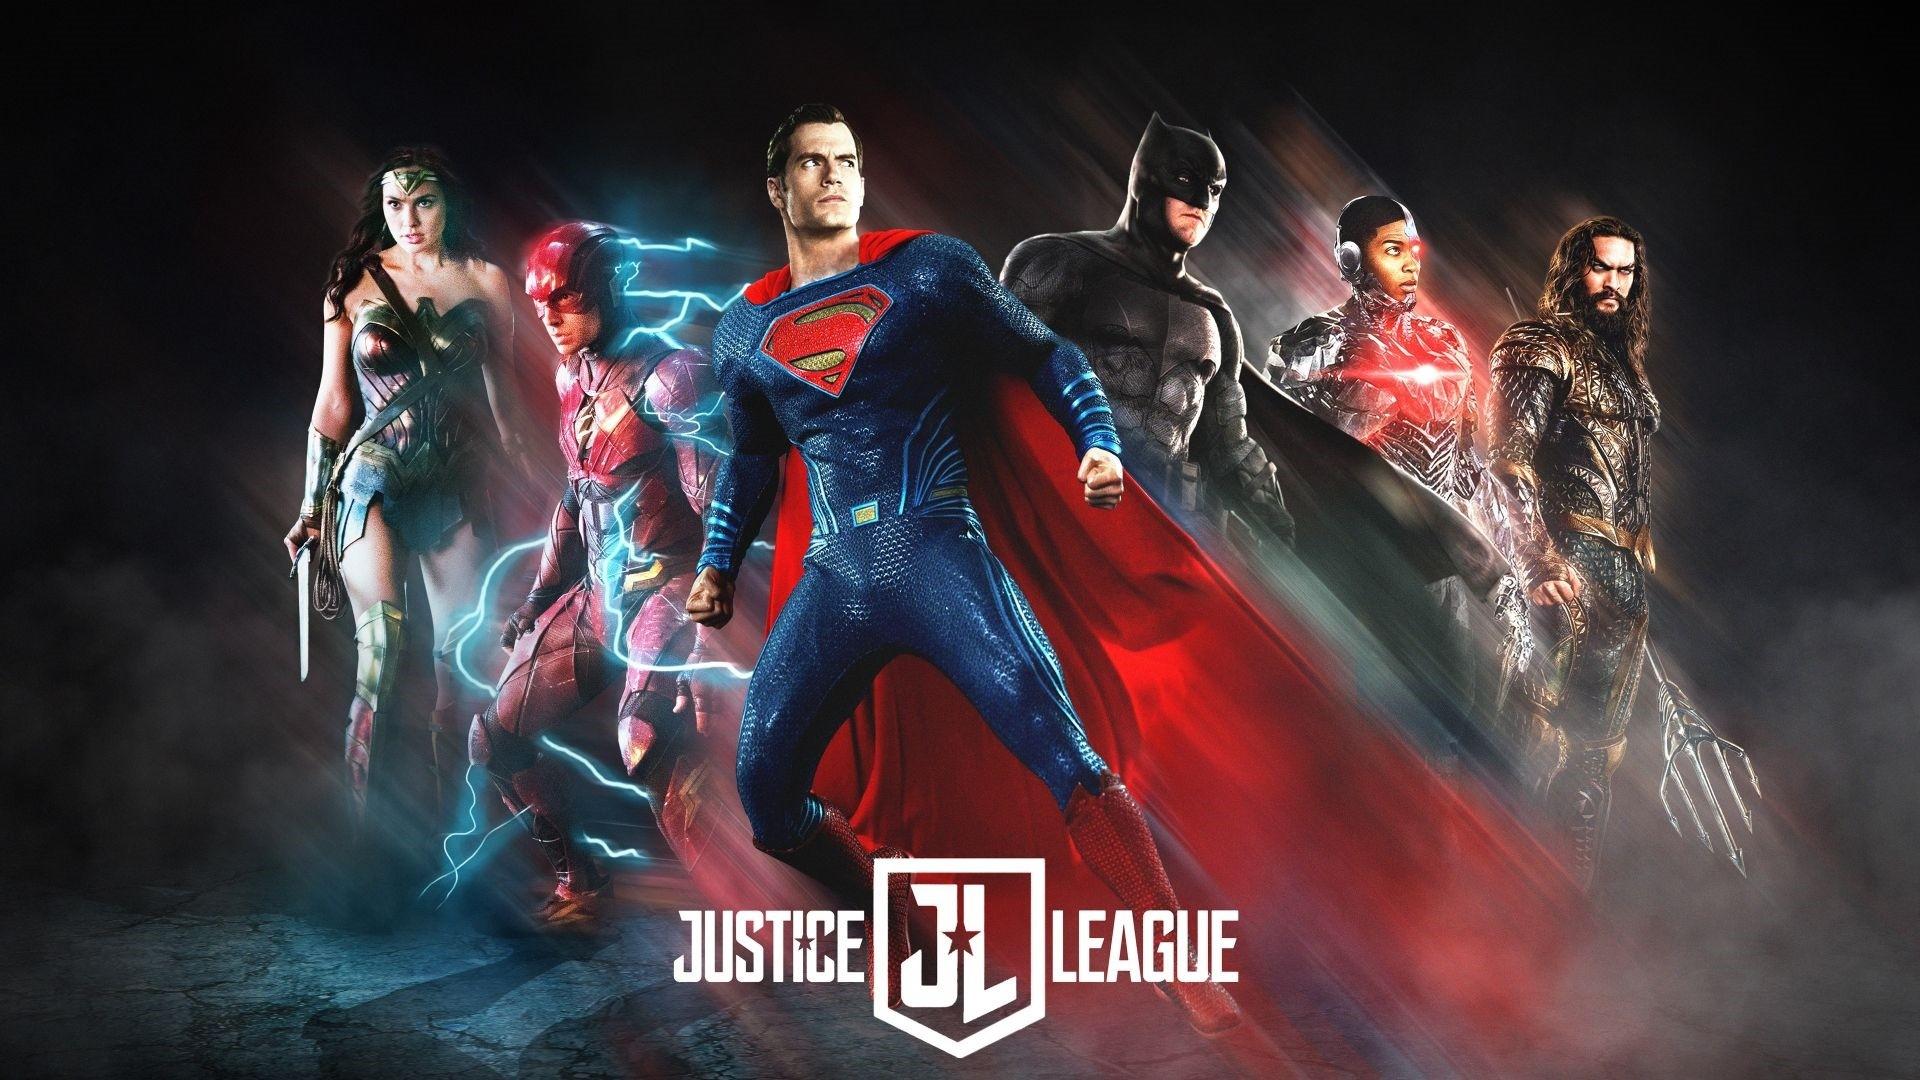 Justice League Poster Wallpaper